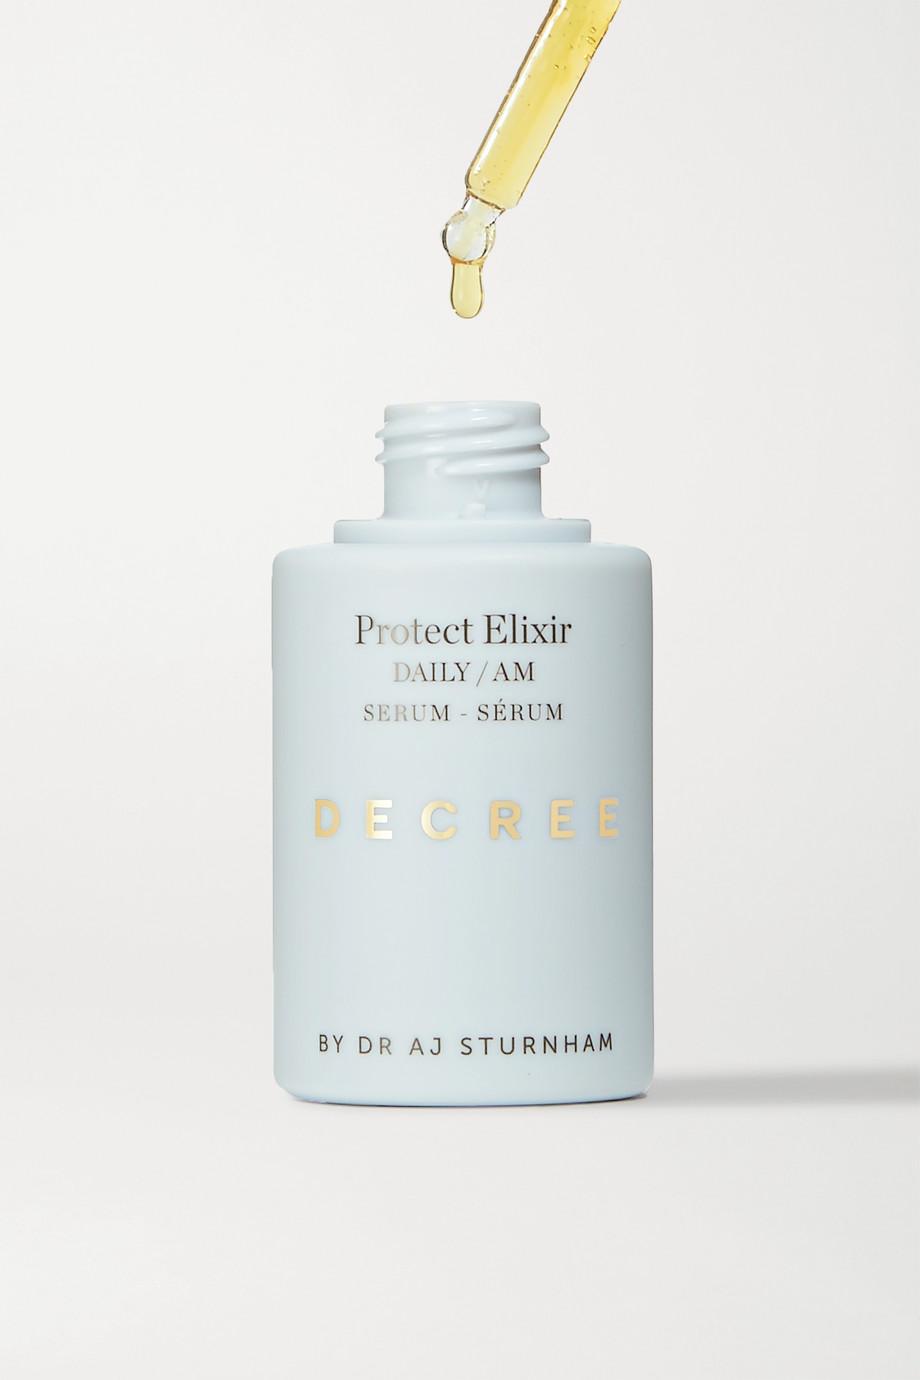 Decree Sérum Protect Elixir, 30 ml